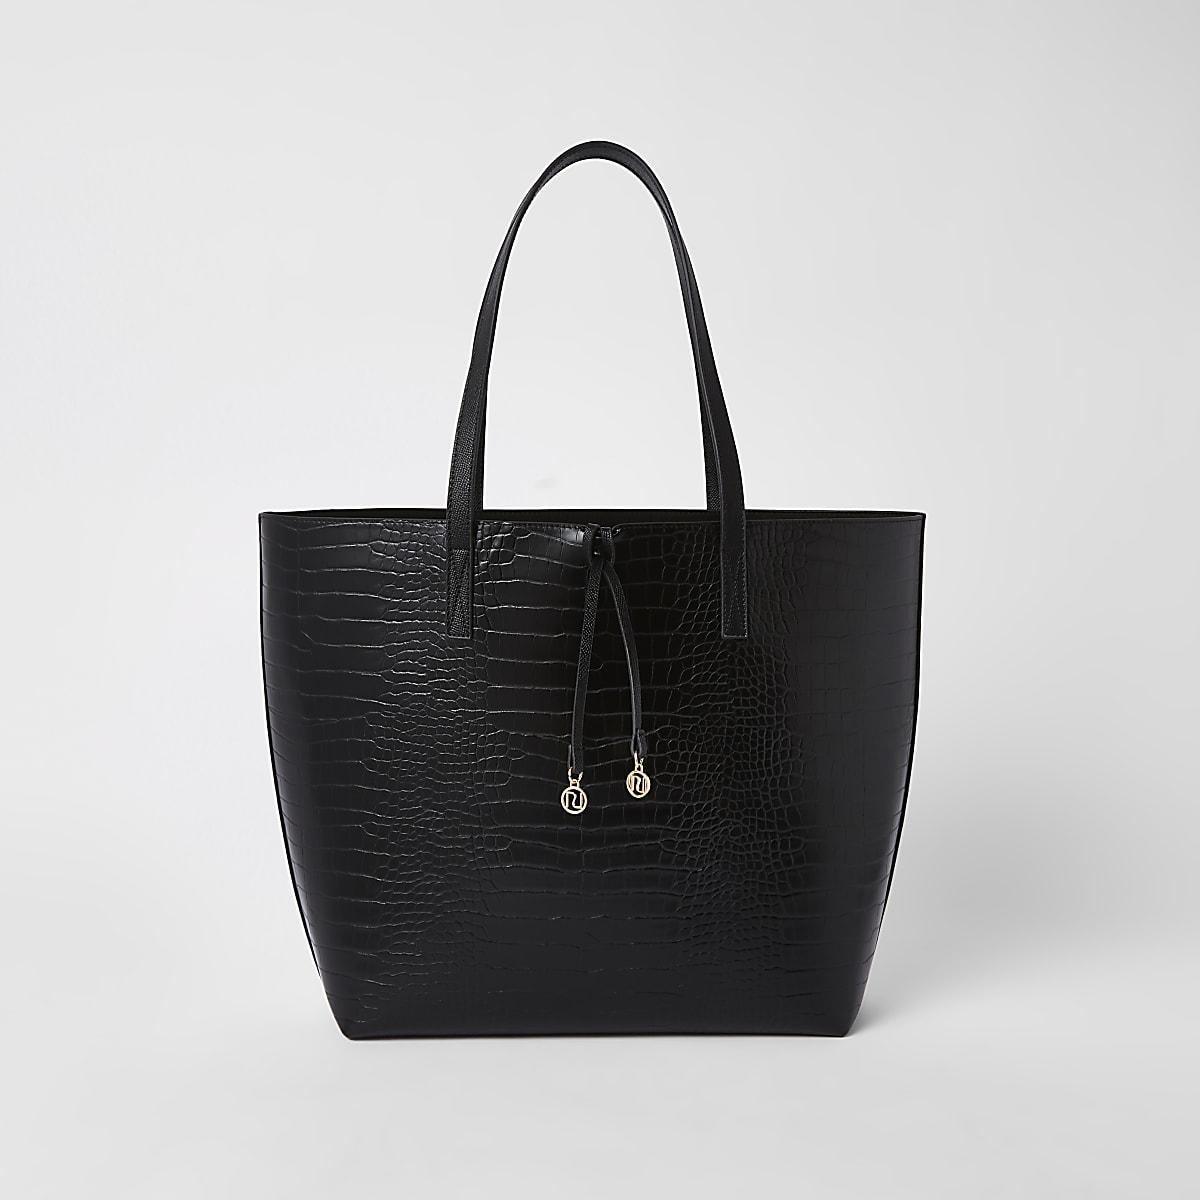 Black croc embossed bag